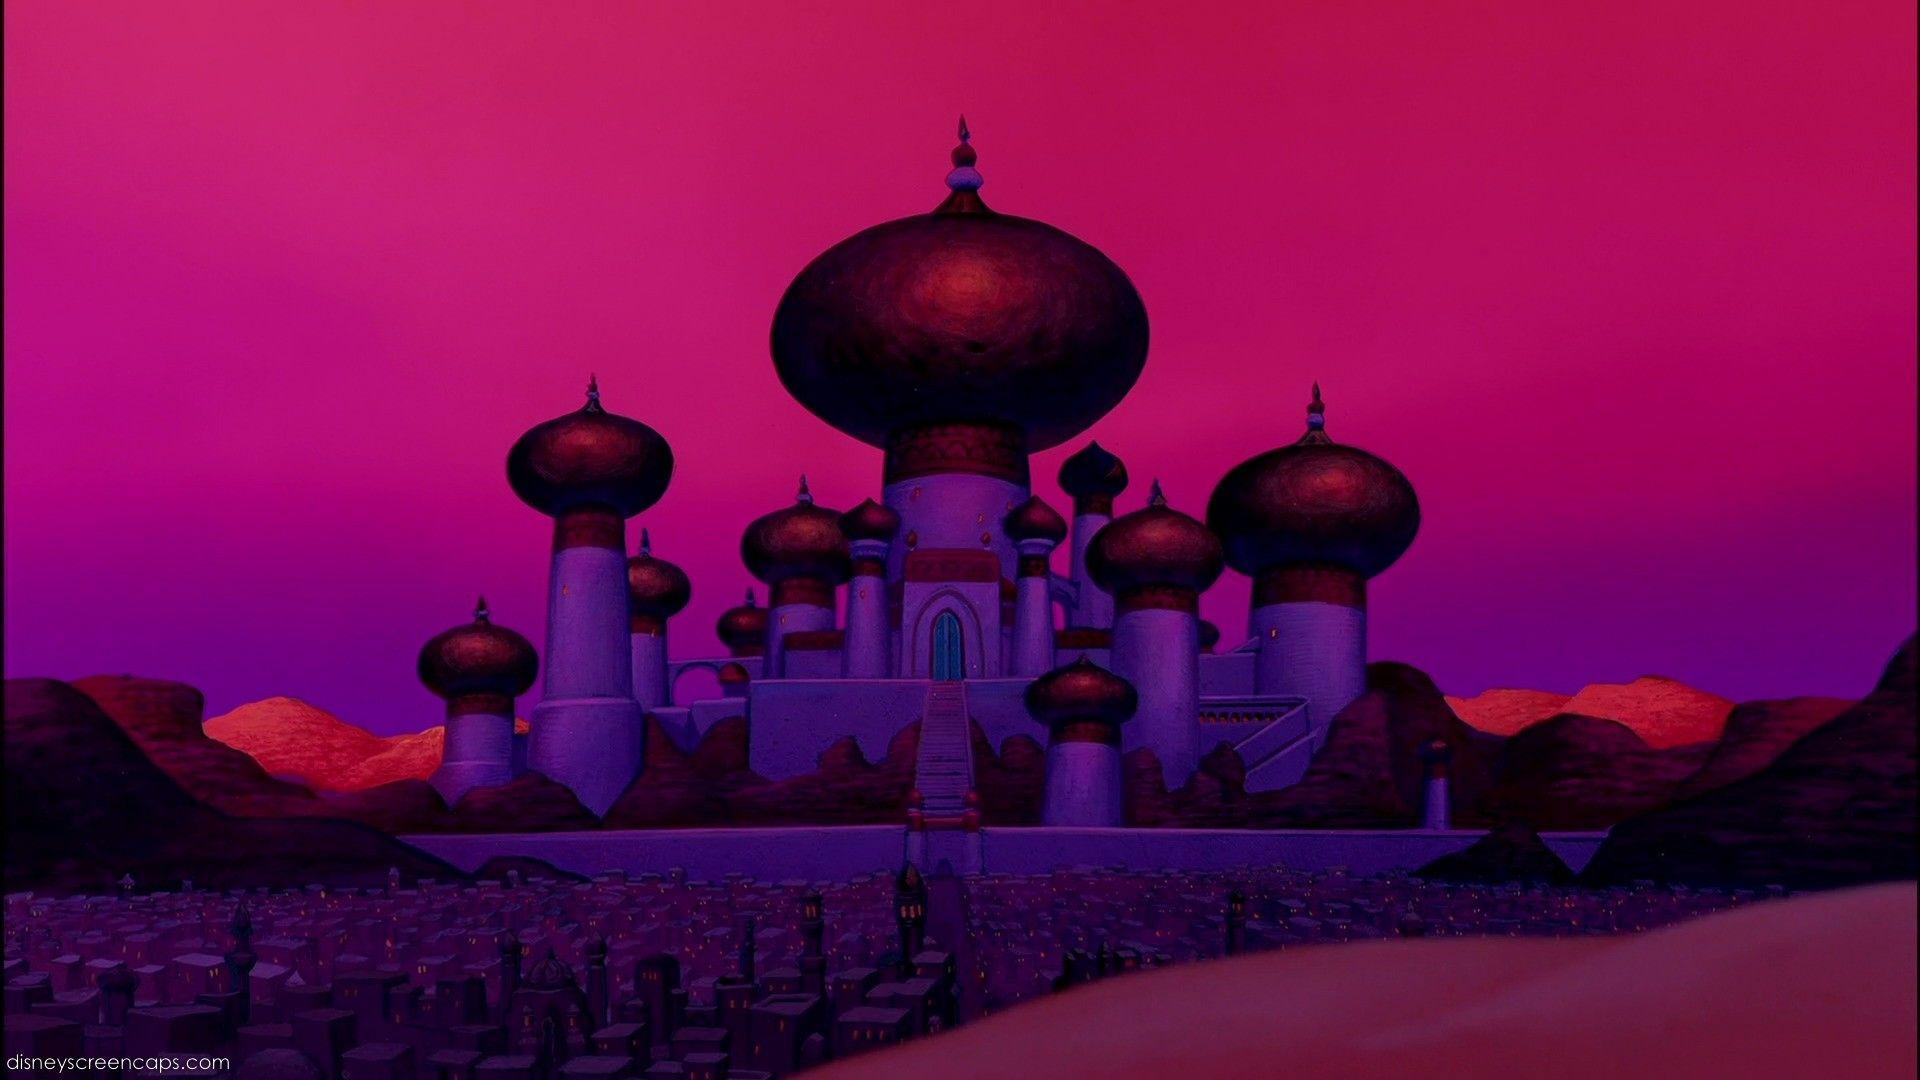 Aladdin Disney Wallpapers - Wallpaper Cave for Aladdin Castle Background  146hul